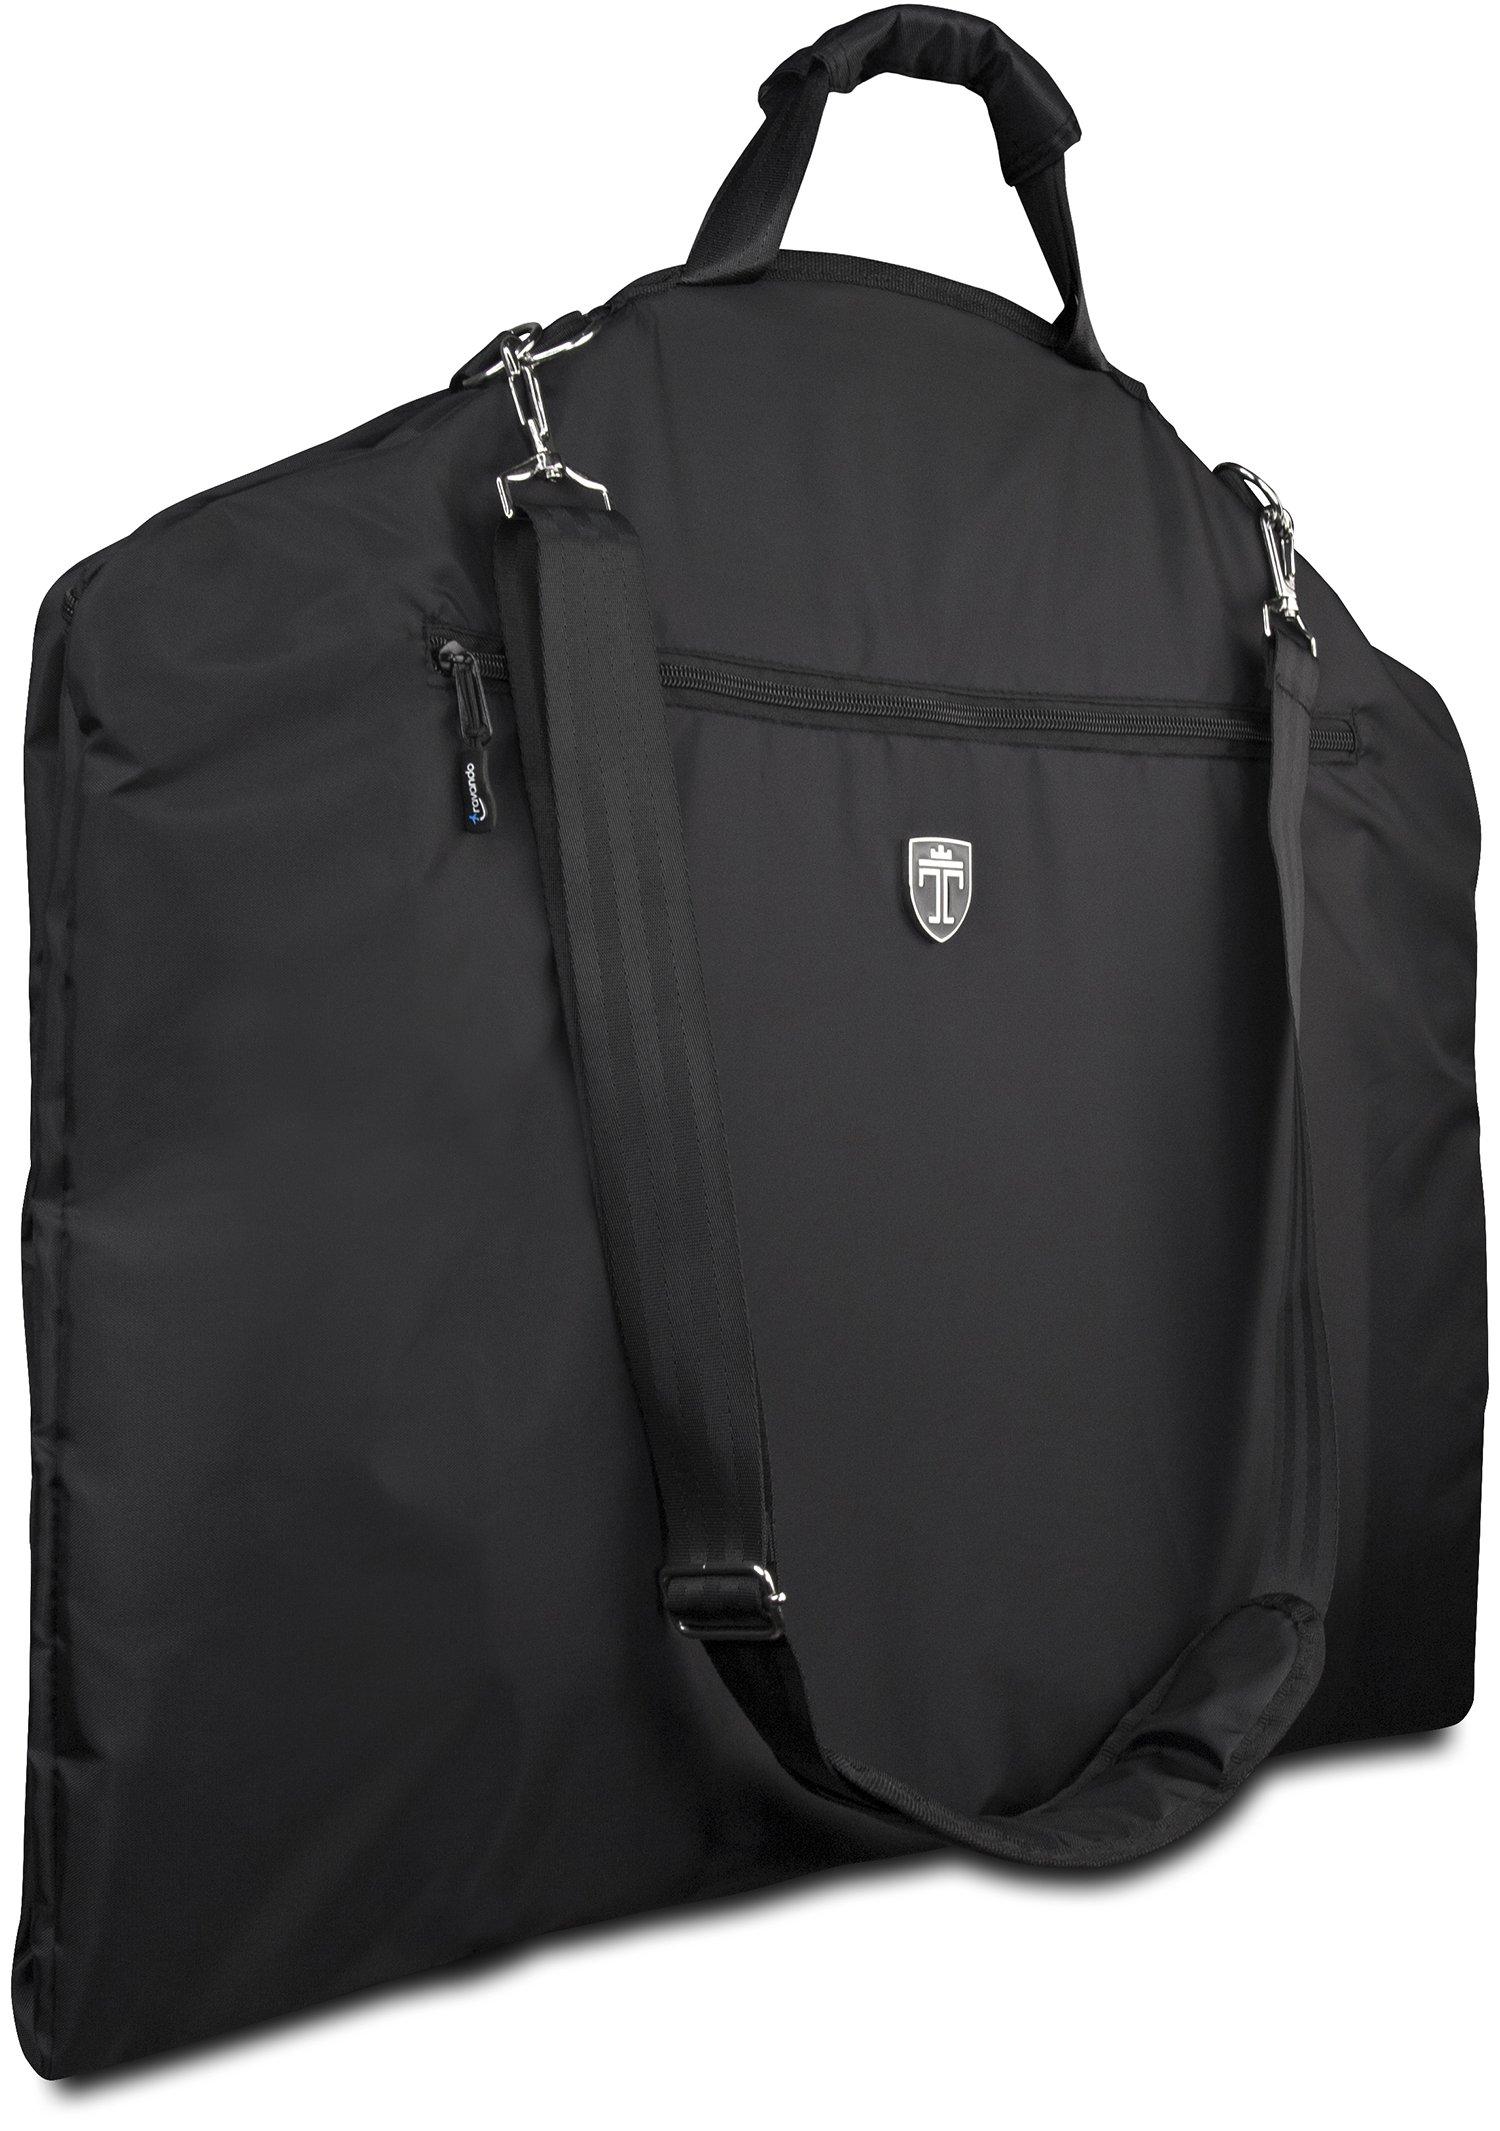 TRAVANDO Garment Bag/Suit Dress Carrier with Laptop Compartment | Business Travel Cover | Clothes Storage Luggage